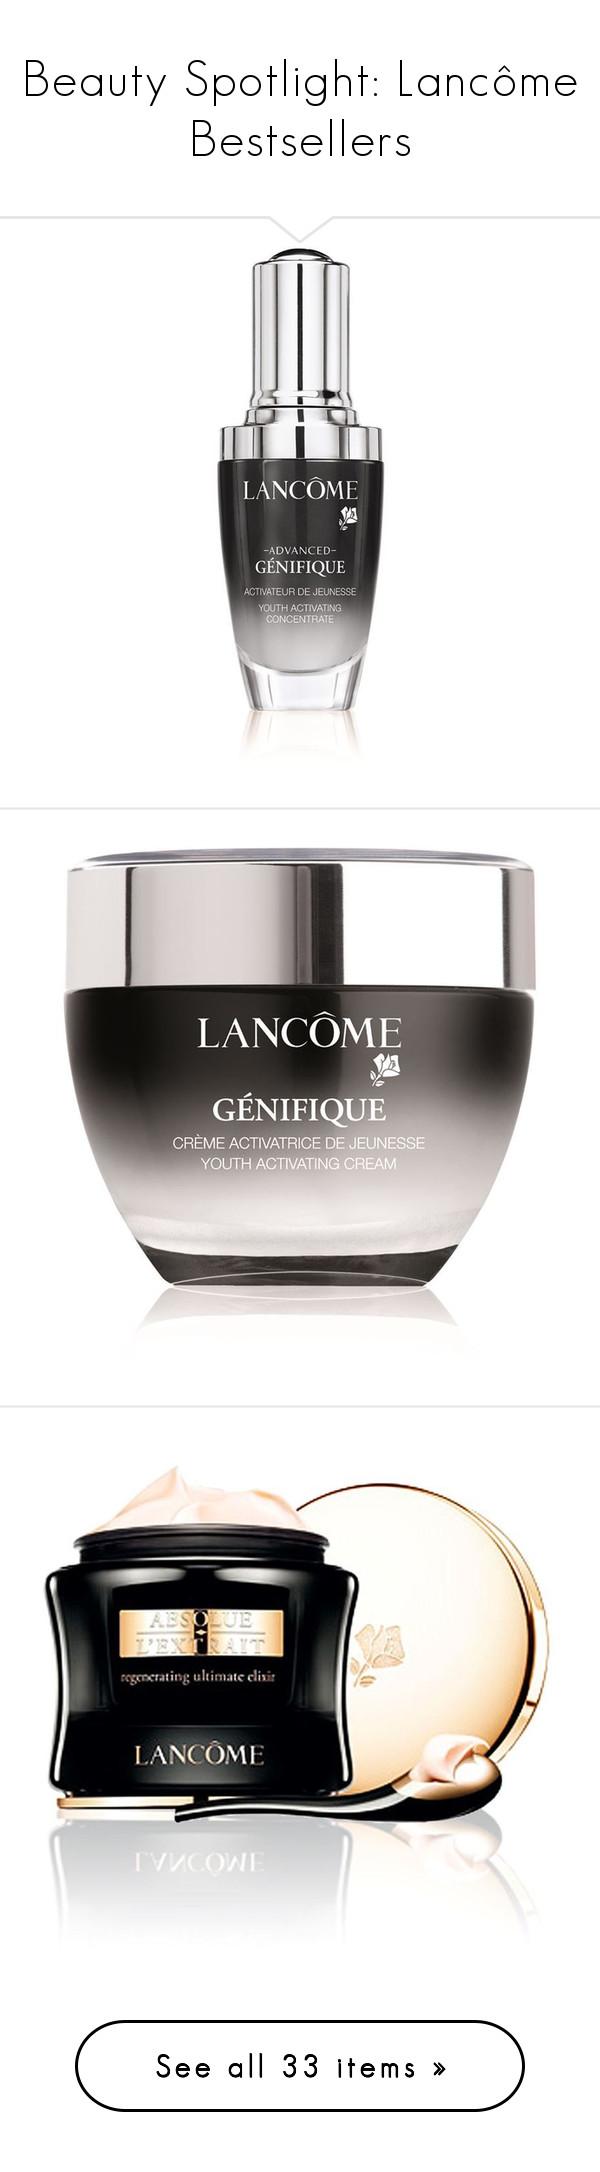 Beauty Spotlight Lancome Bestsellers Lancome Skincare Lancome Skin Care Solutions